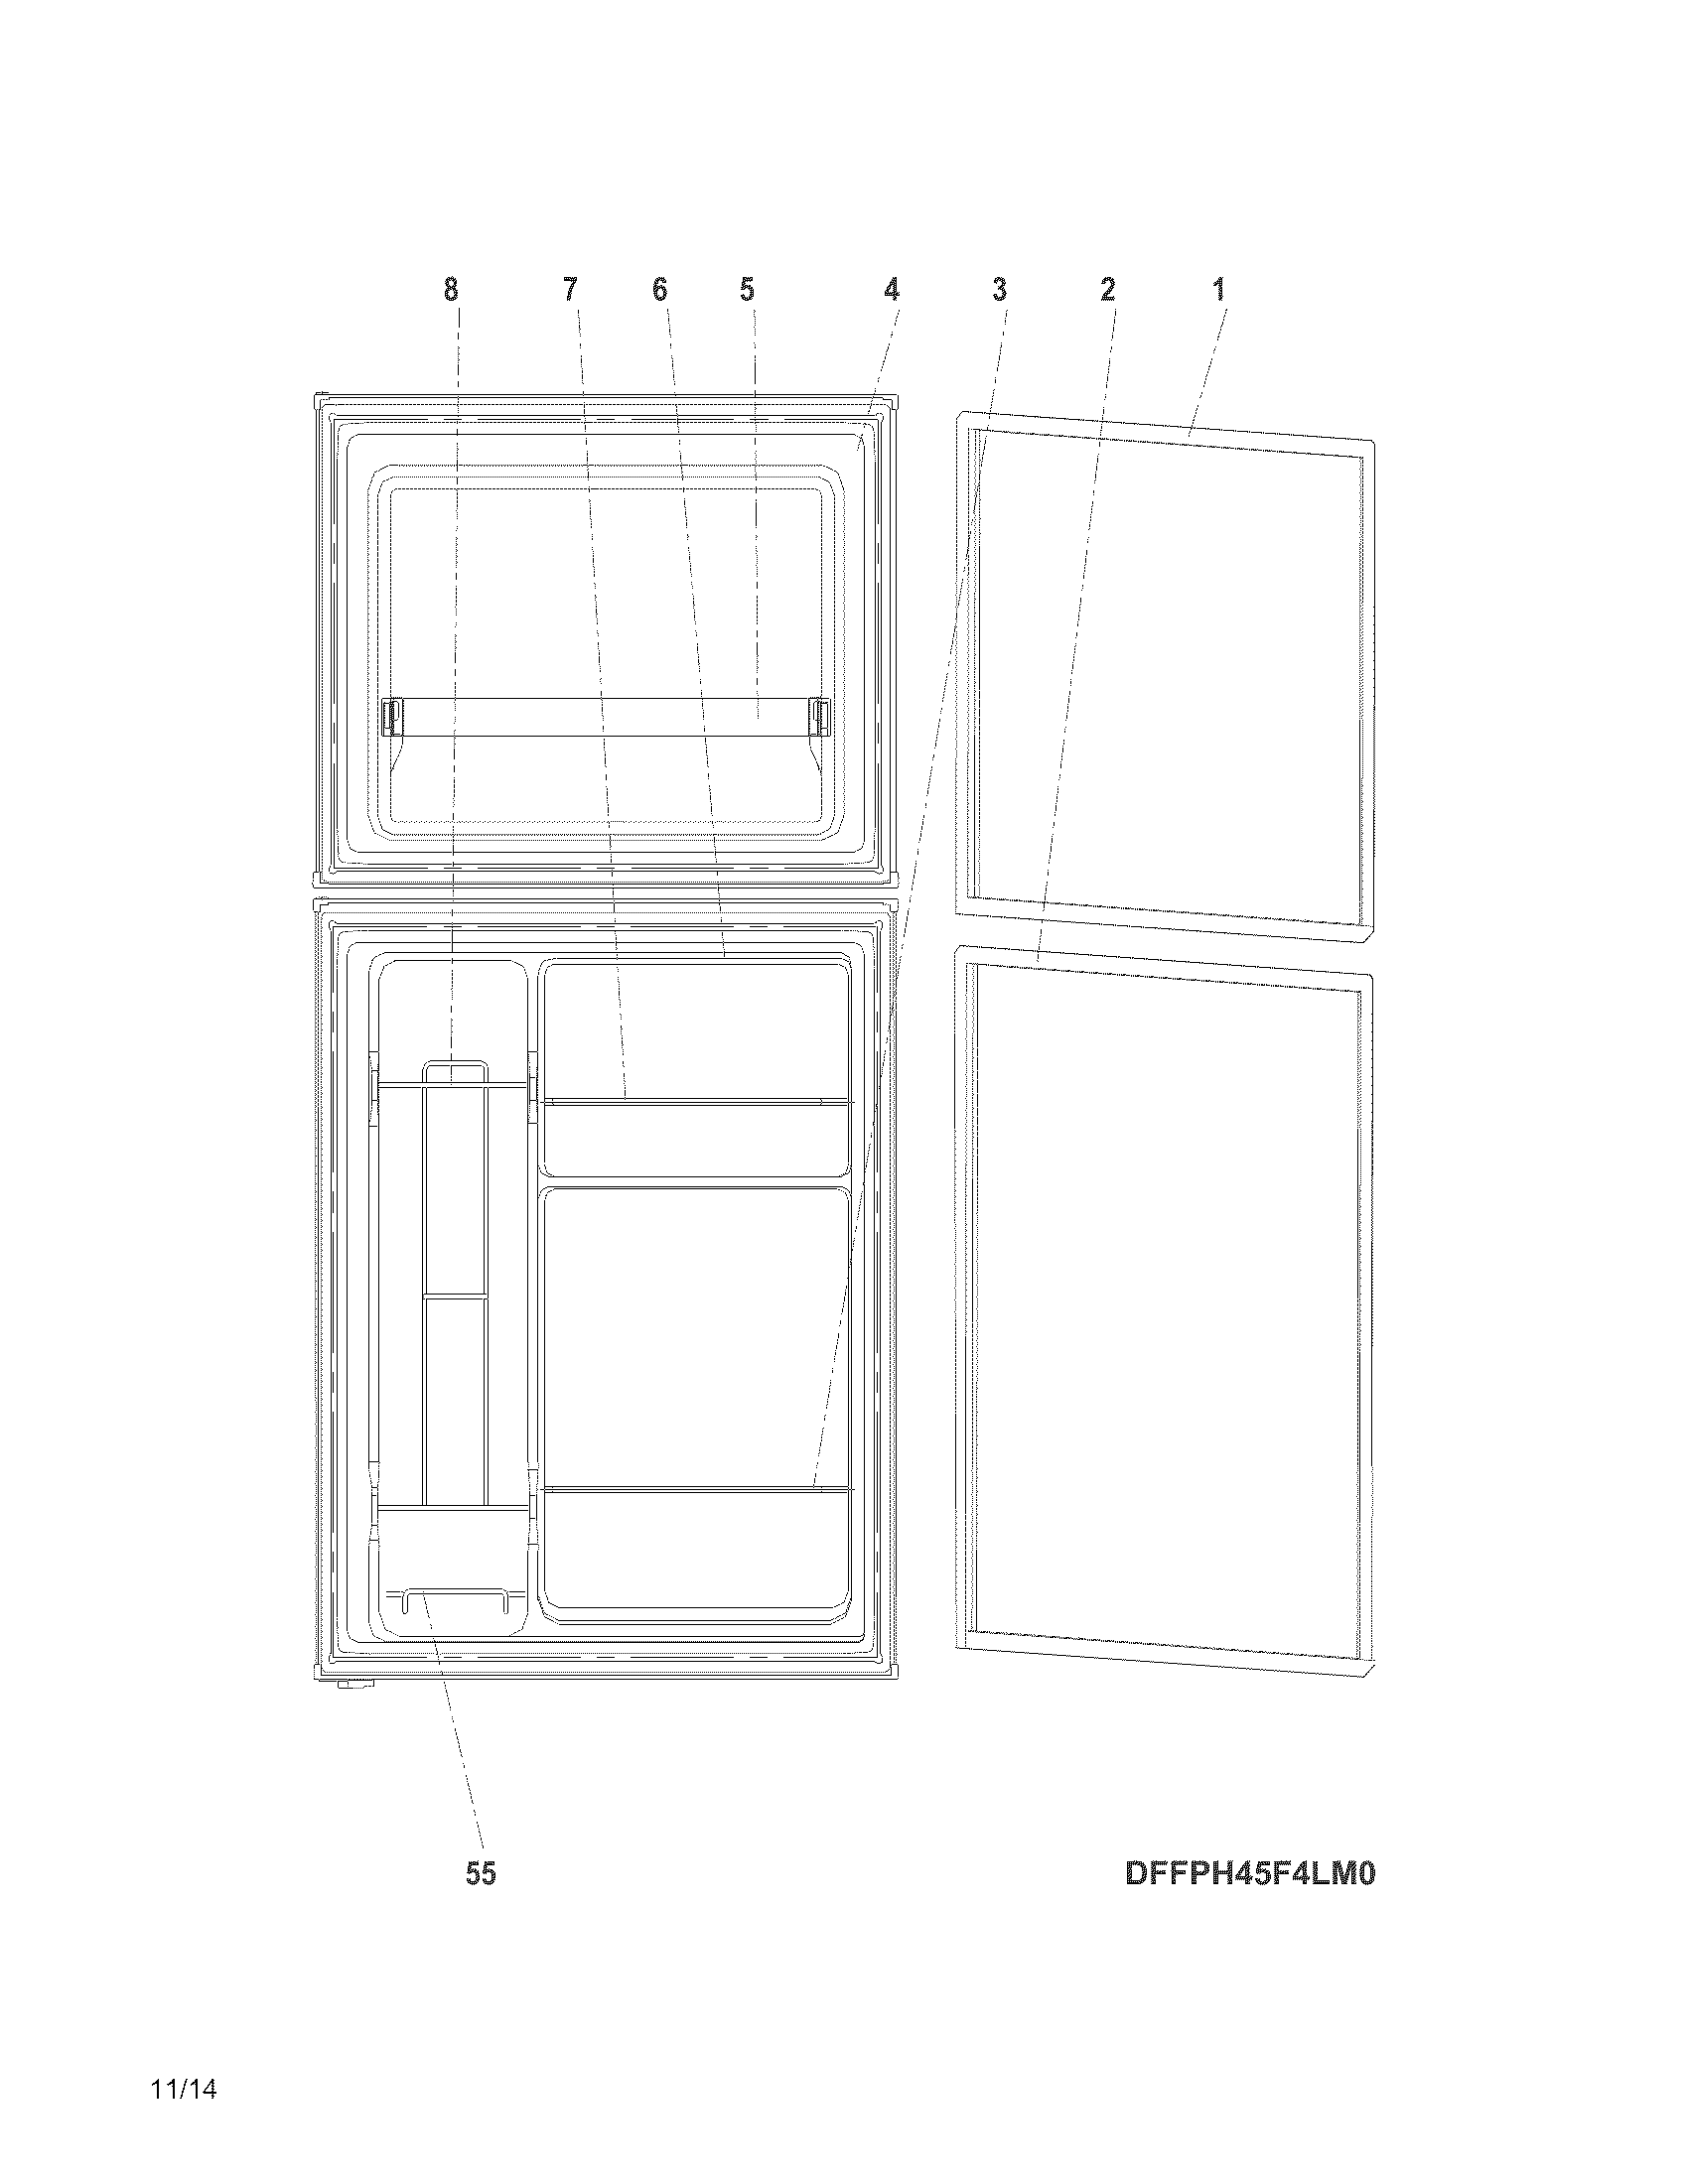 Frigidaire model FFPS45L3QM0 under counter refrigerator